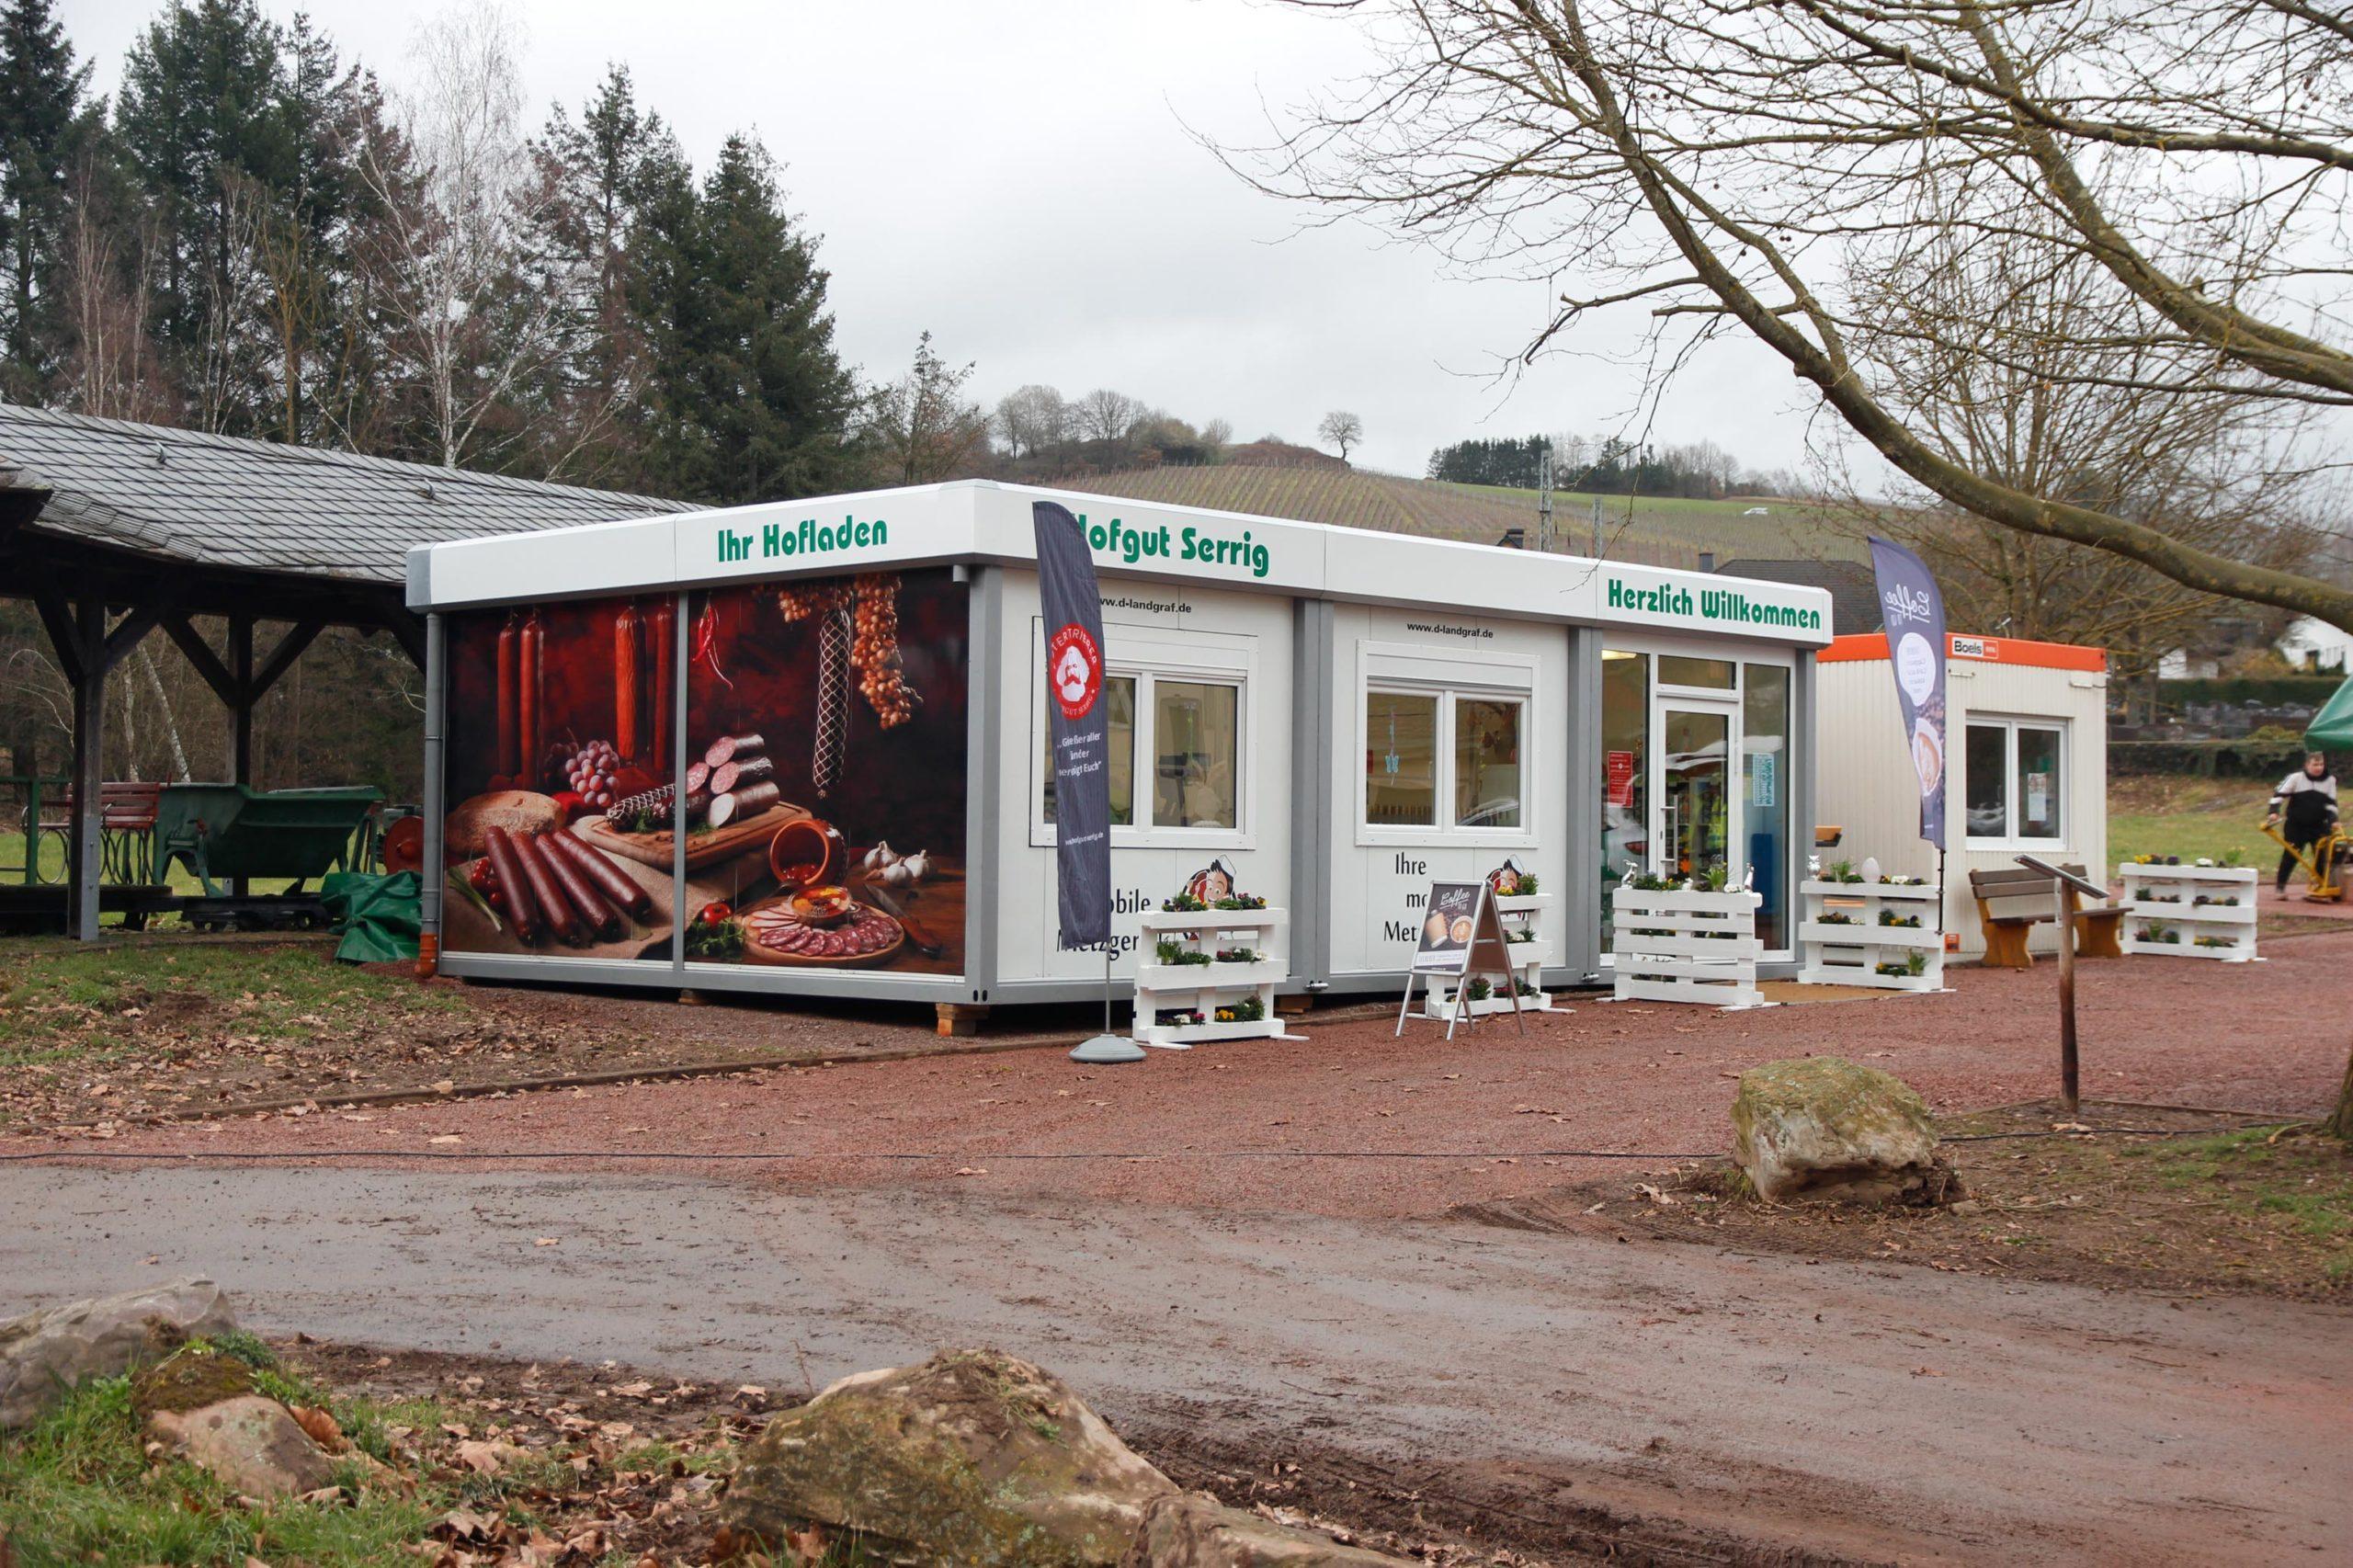 Photo of Hofgut Serrig eröffnet heute den Hofgutladen an der B 51 – Ortseinfahrt Serrig